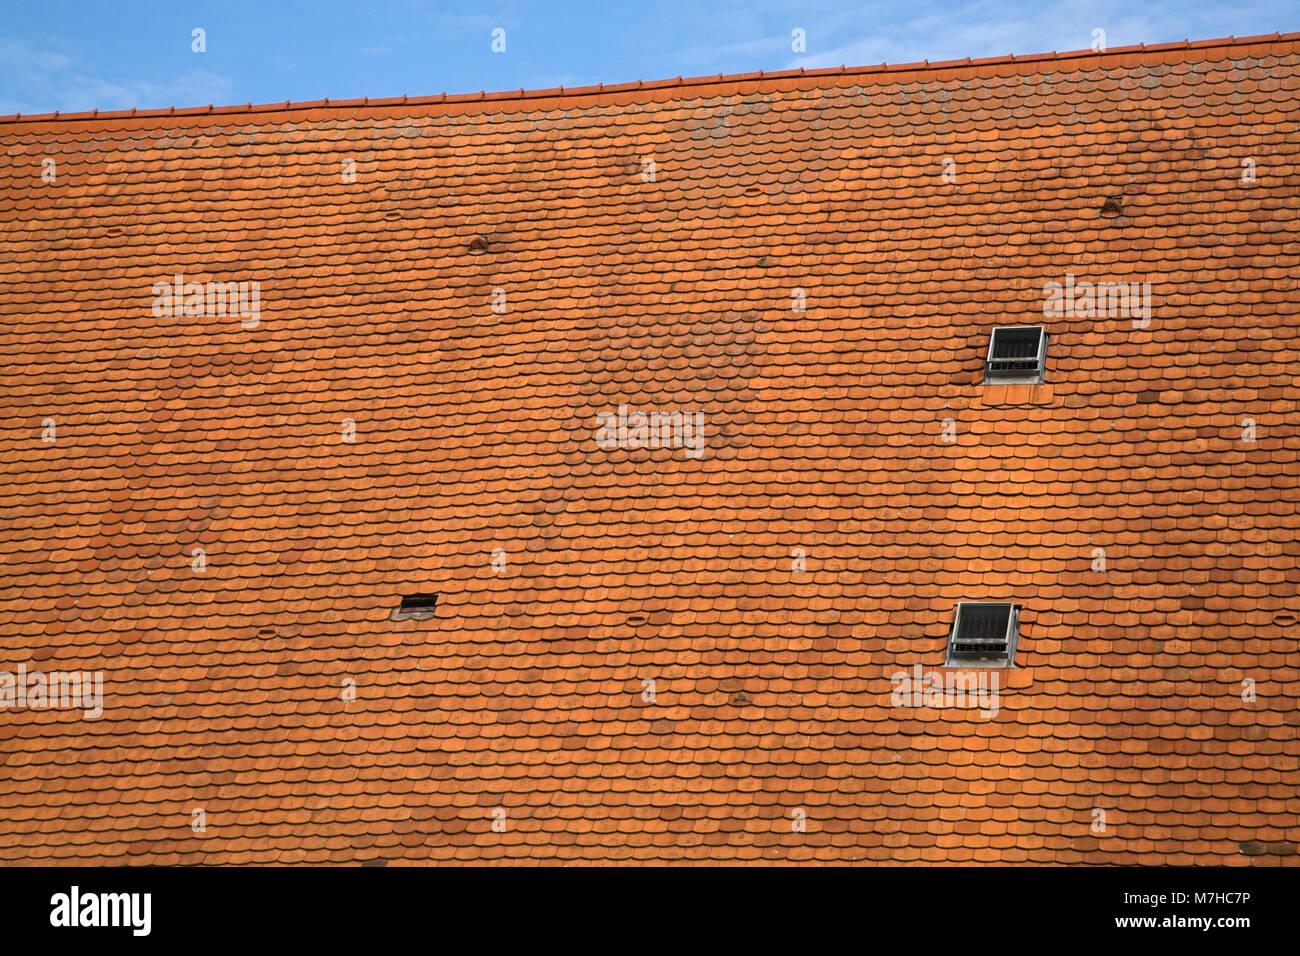 Weathered ceramic roof tiles stock photos weathered ceramic roof pitched roof with terracotta ceramic tiles stock image dailygadgetfo Image collections